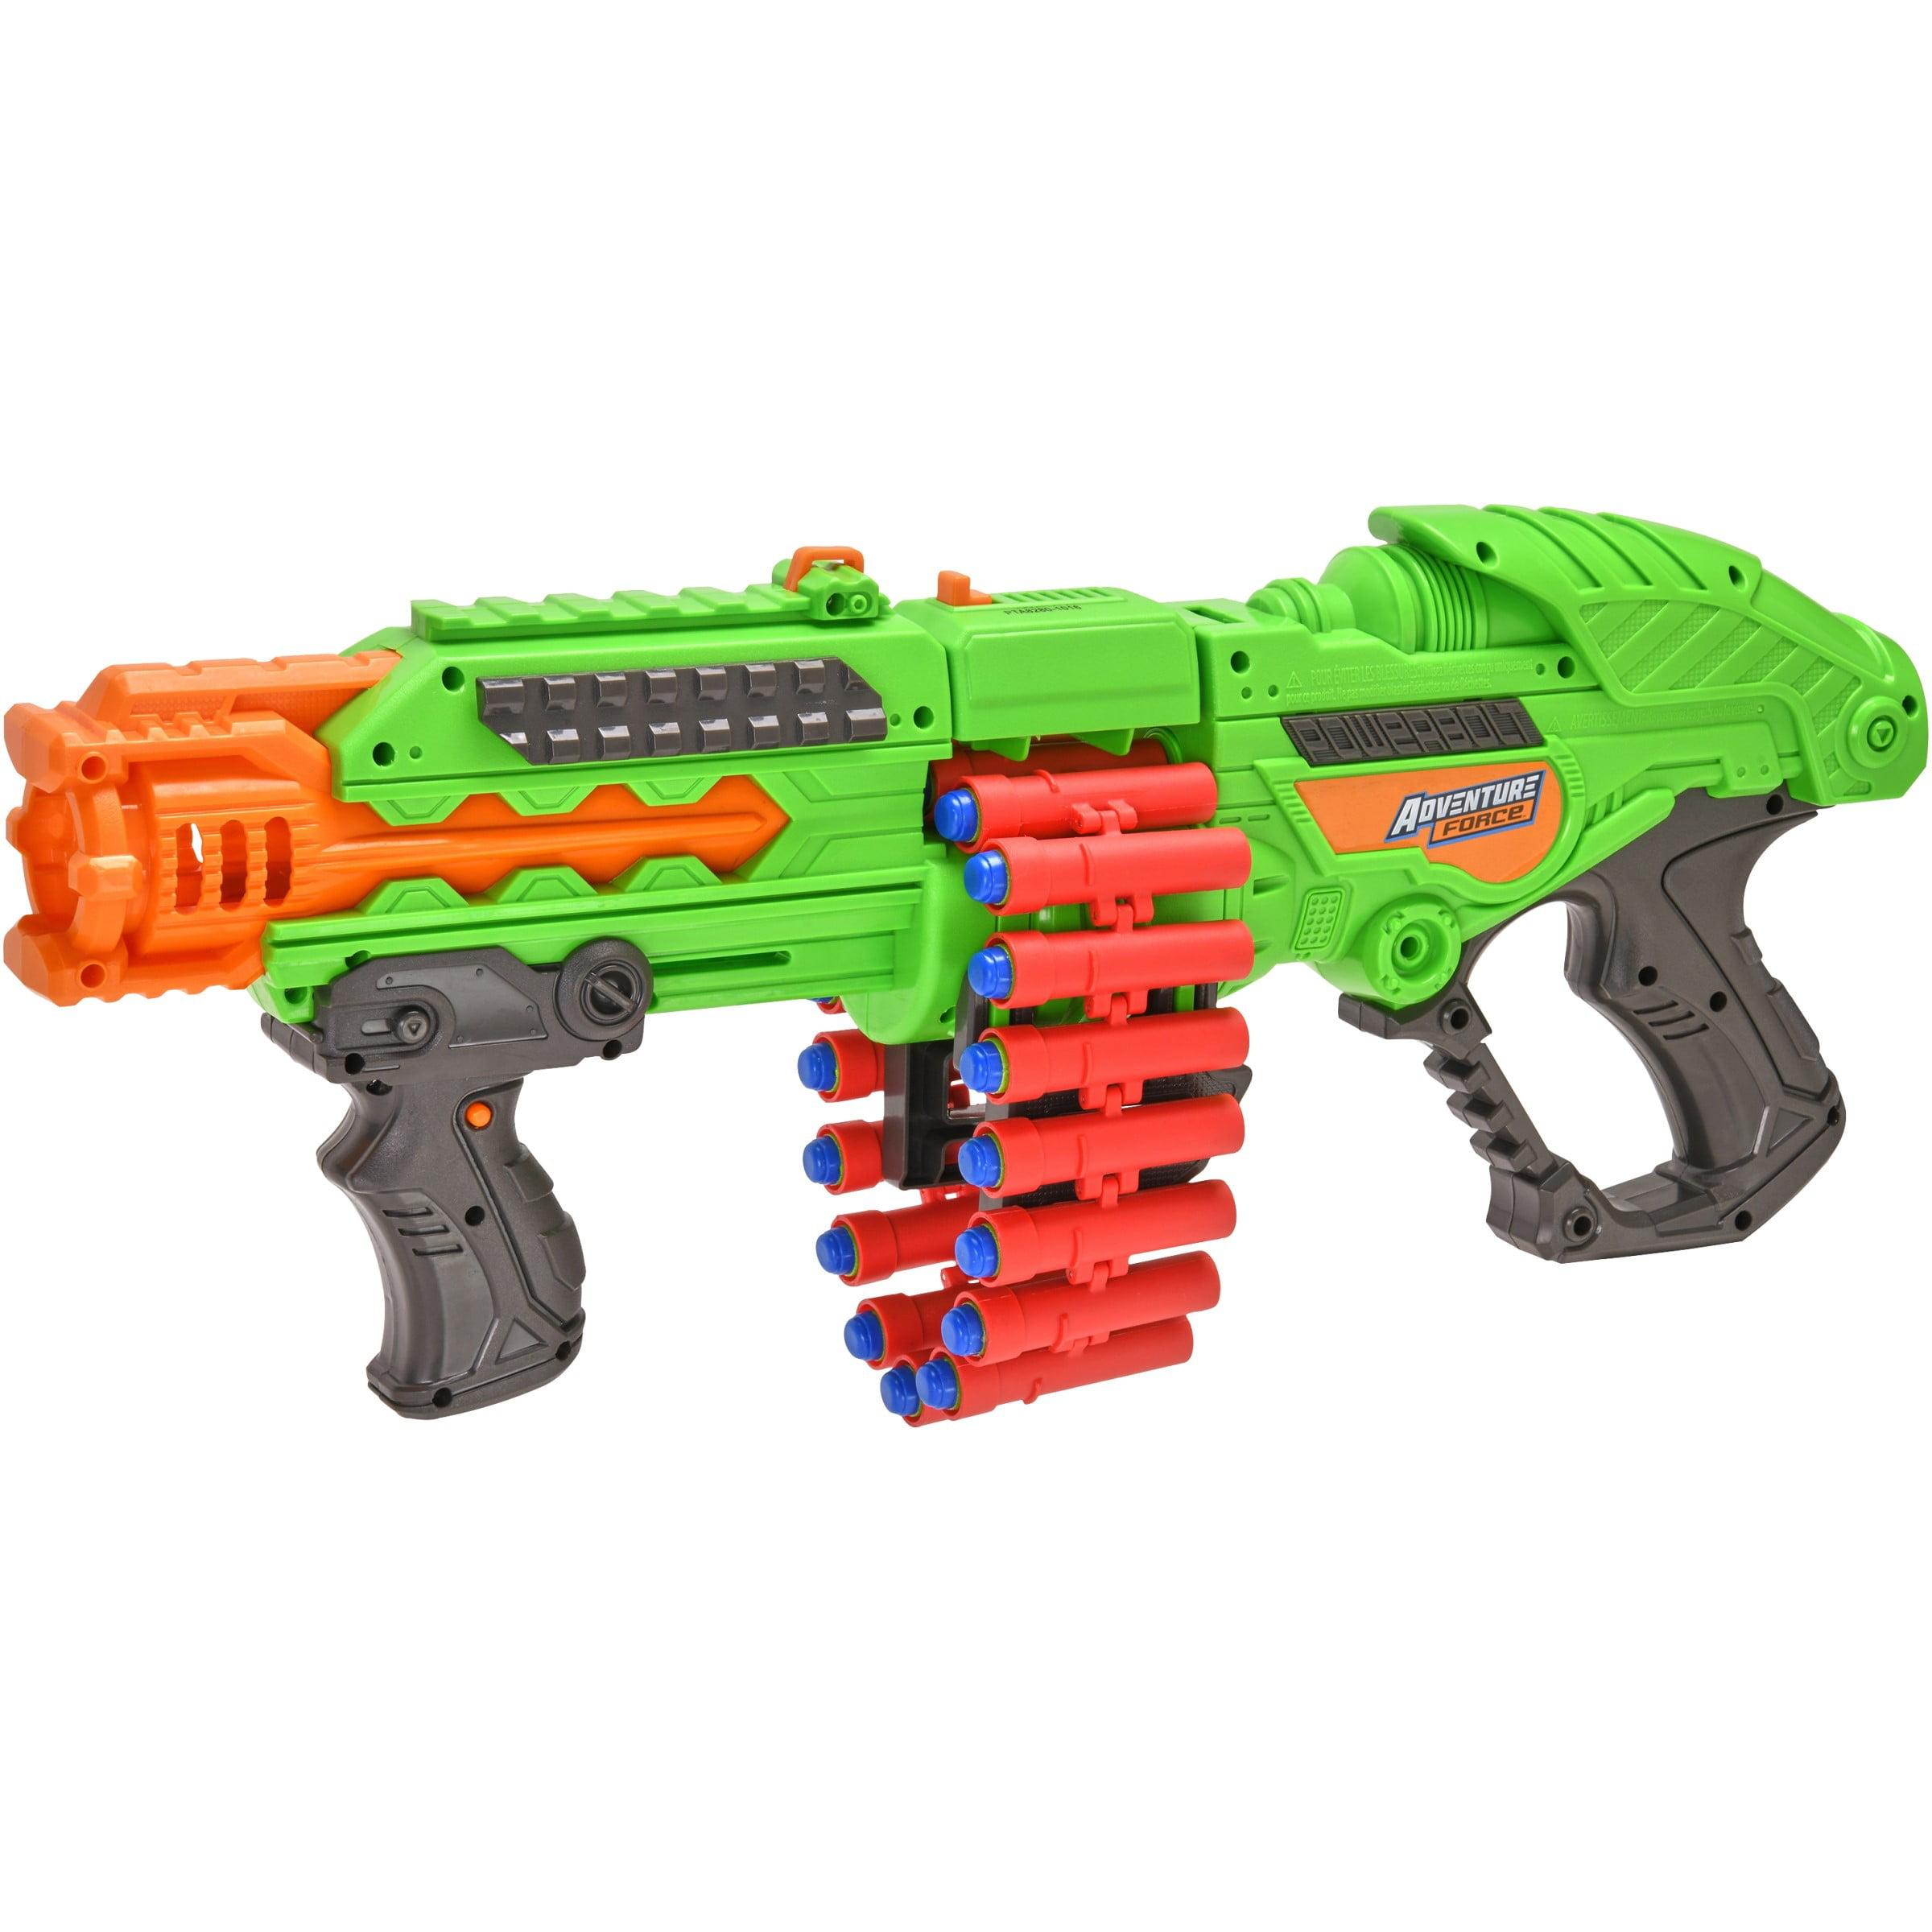 Adventure Force Powerbolt Pump-Action Belt Blaster, green